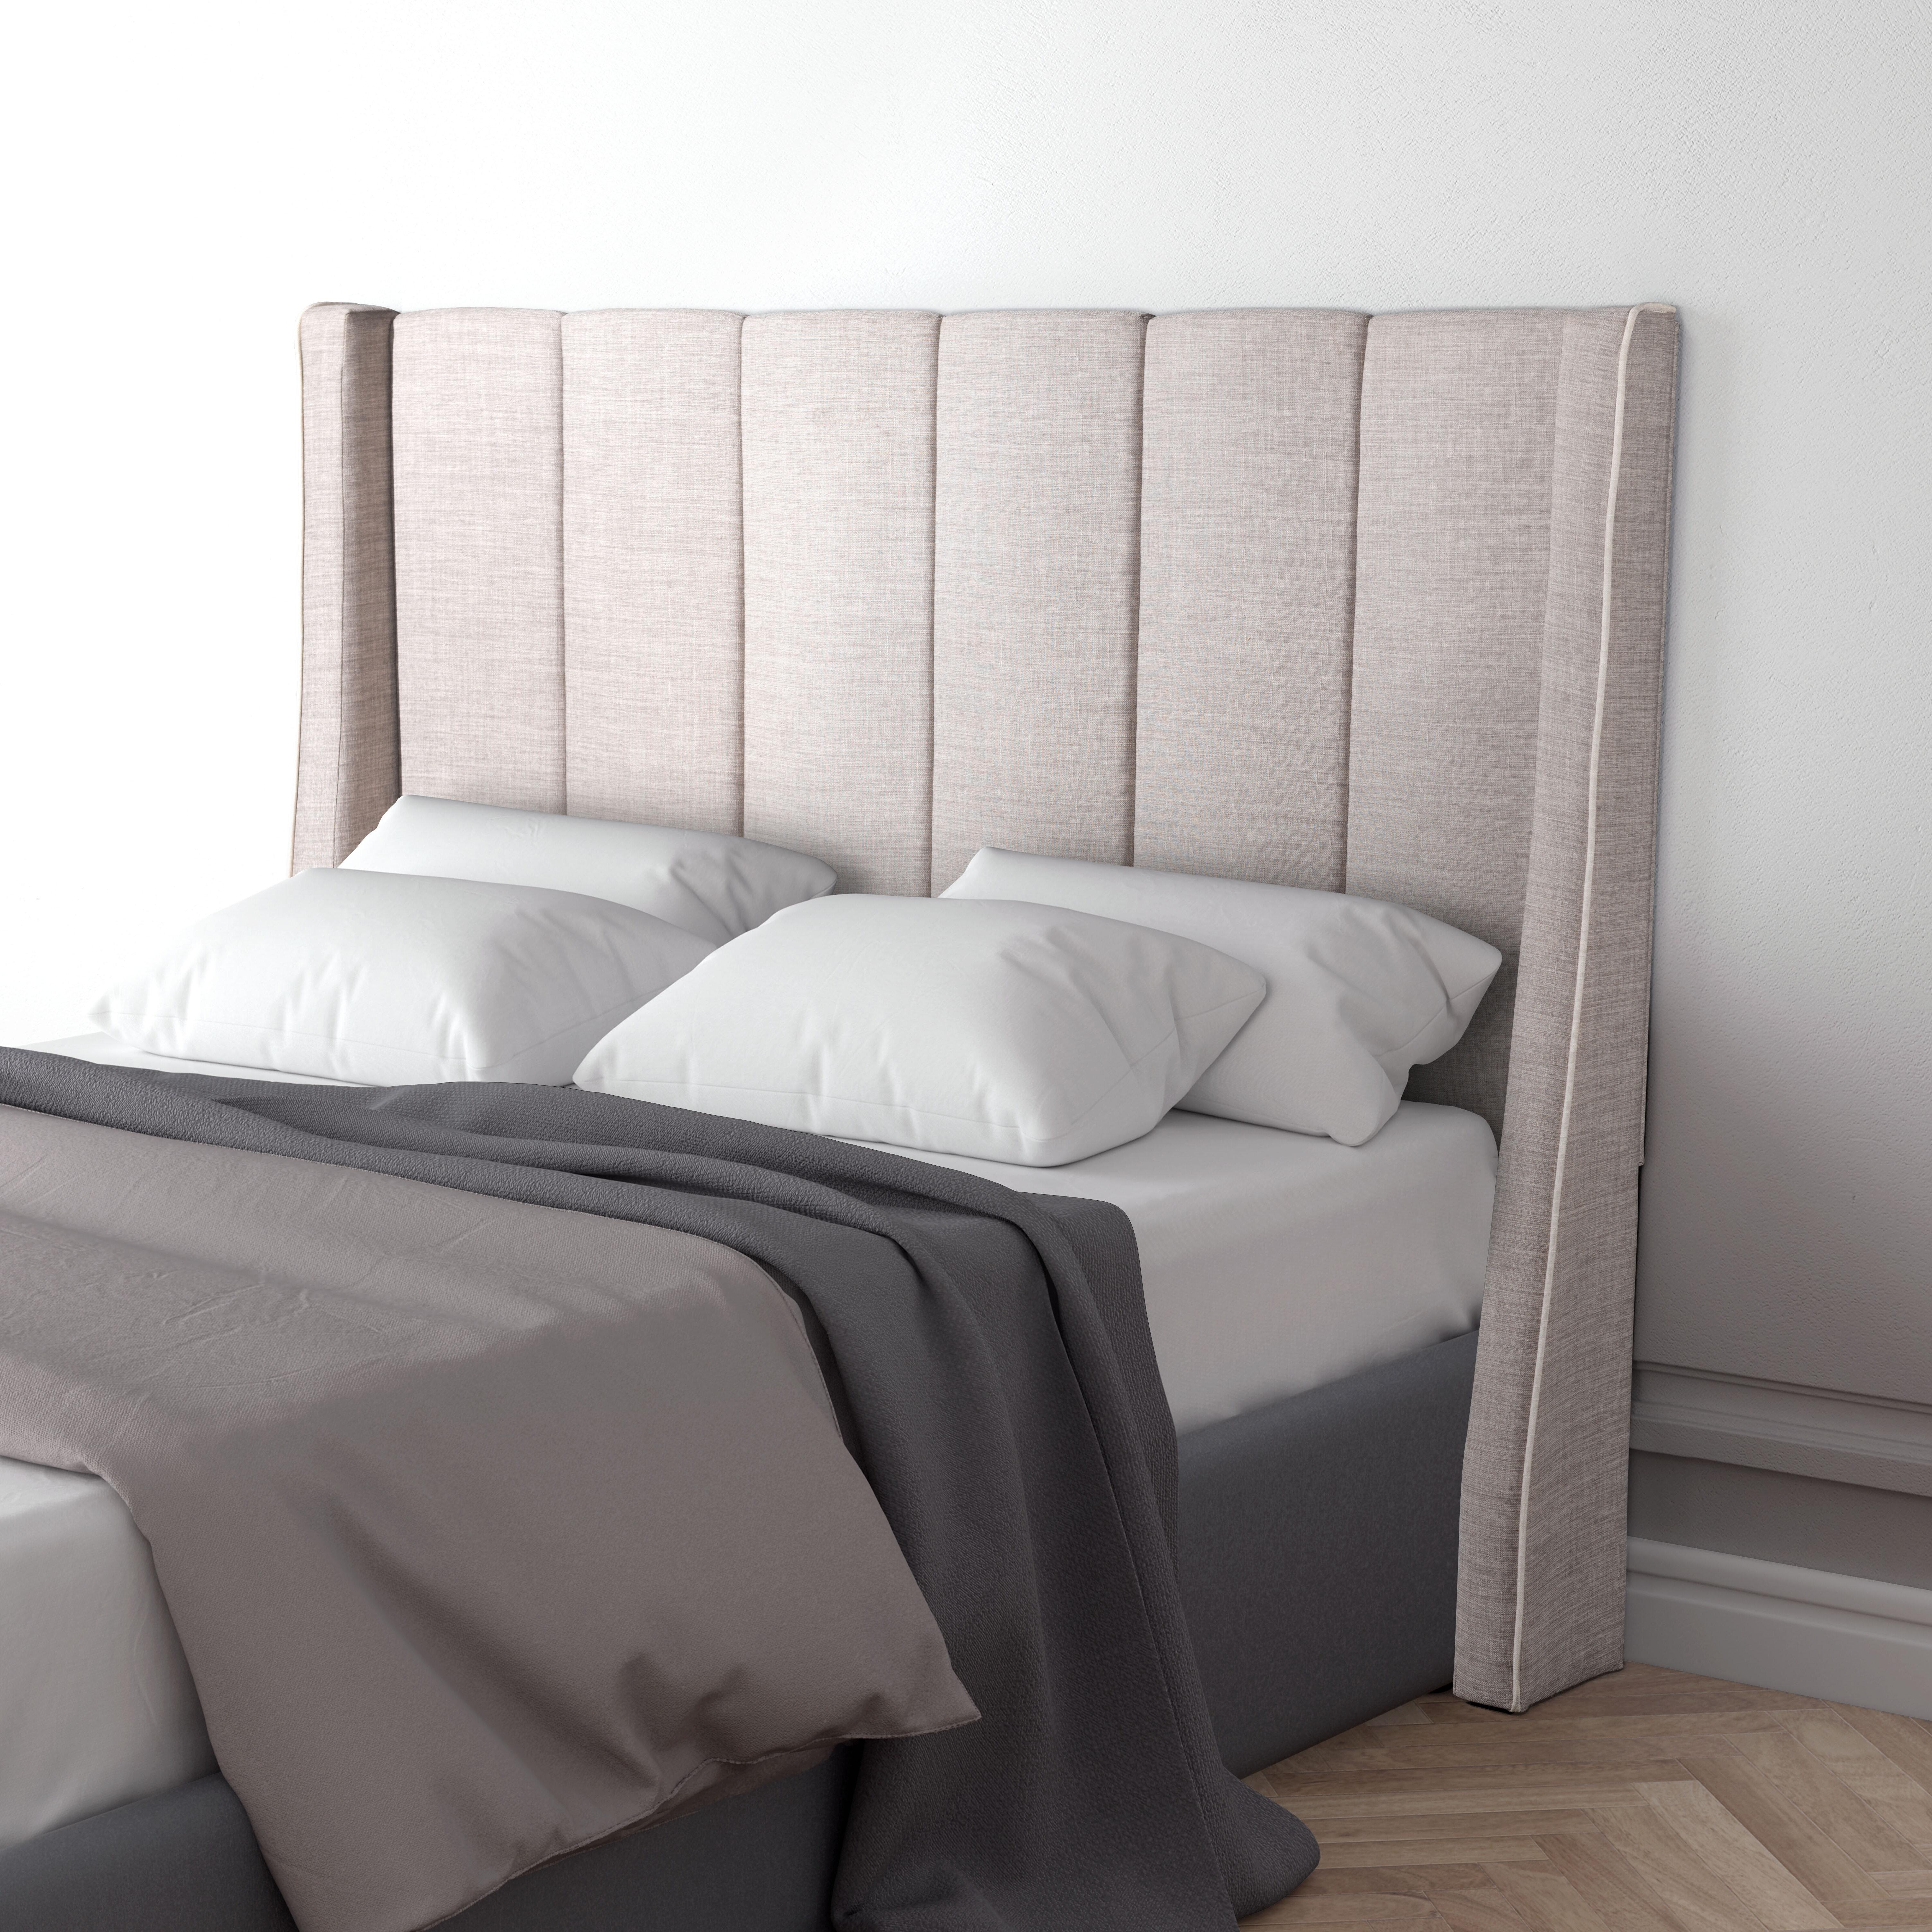 headboard hei anthropologie furniture bed frames beds b slipcovered bohemian headboards unique kalmar